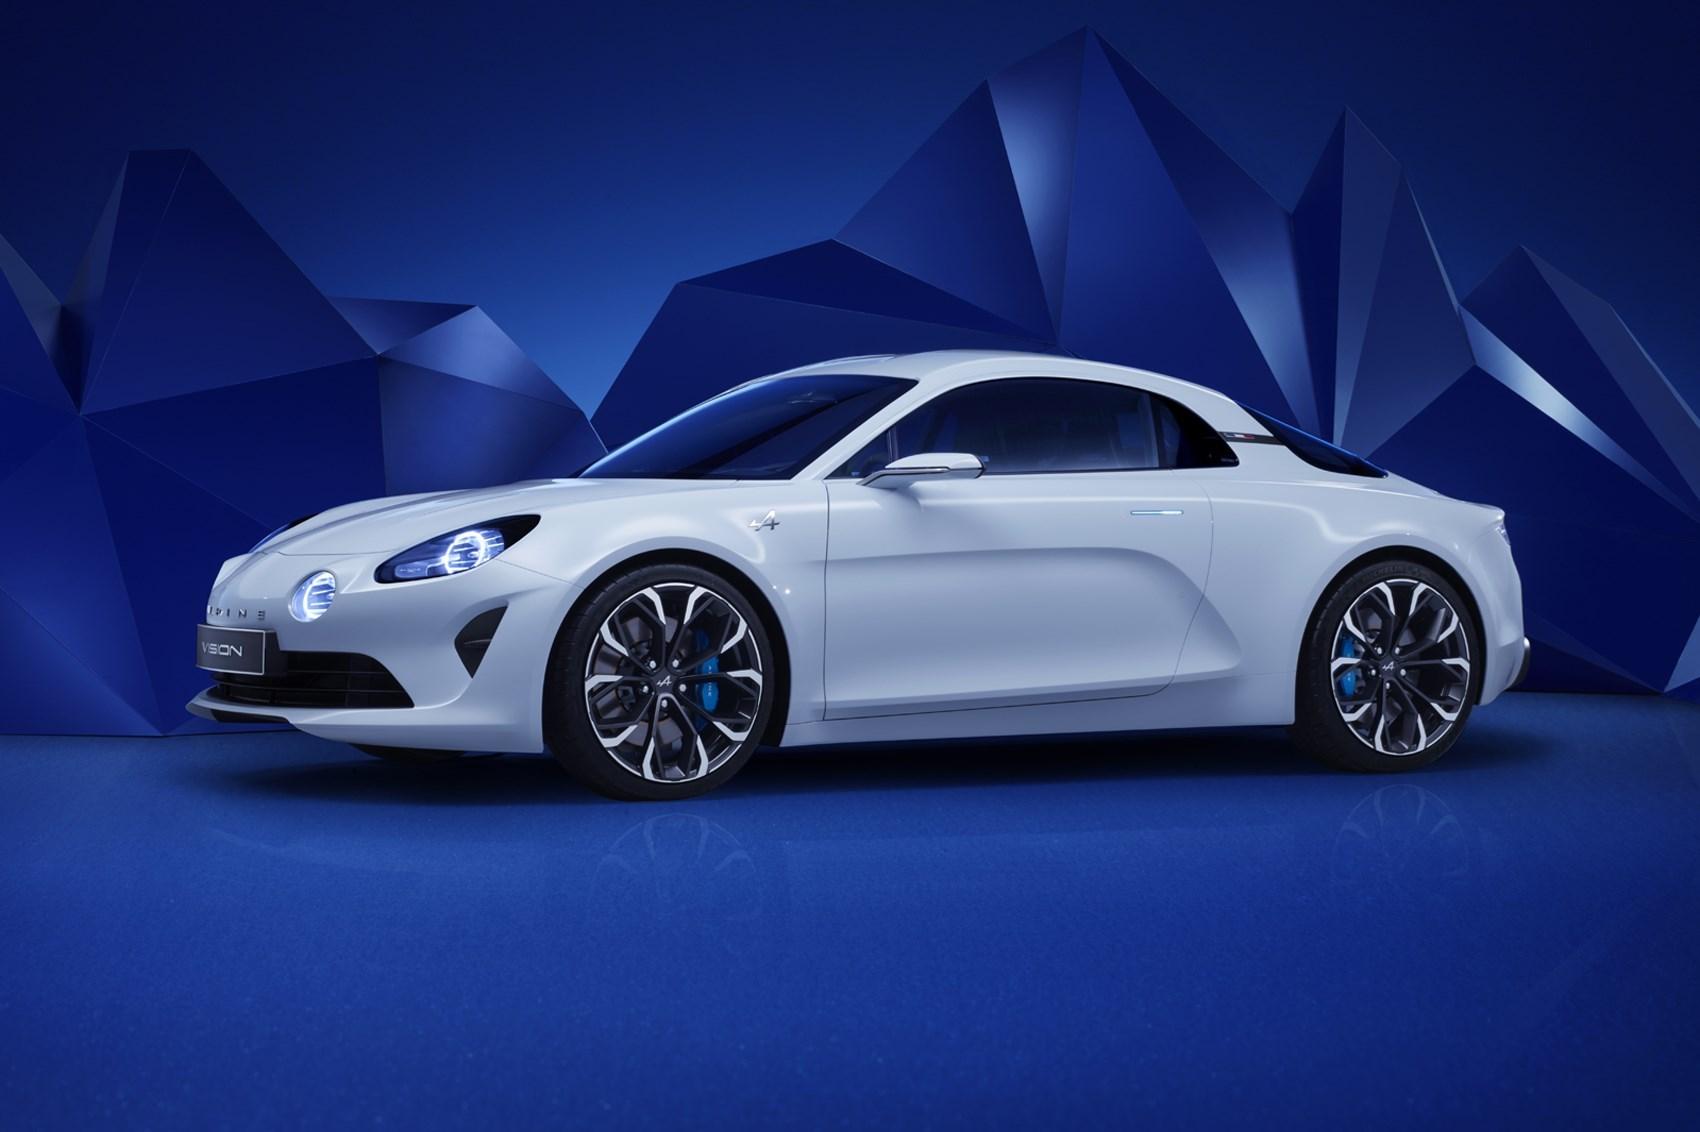 2018 renault alpine. beautiful alpine the 2016 alpine vision concept car inside 2018 renault alpine 1